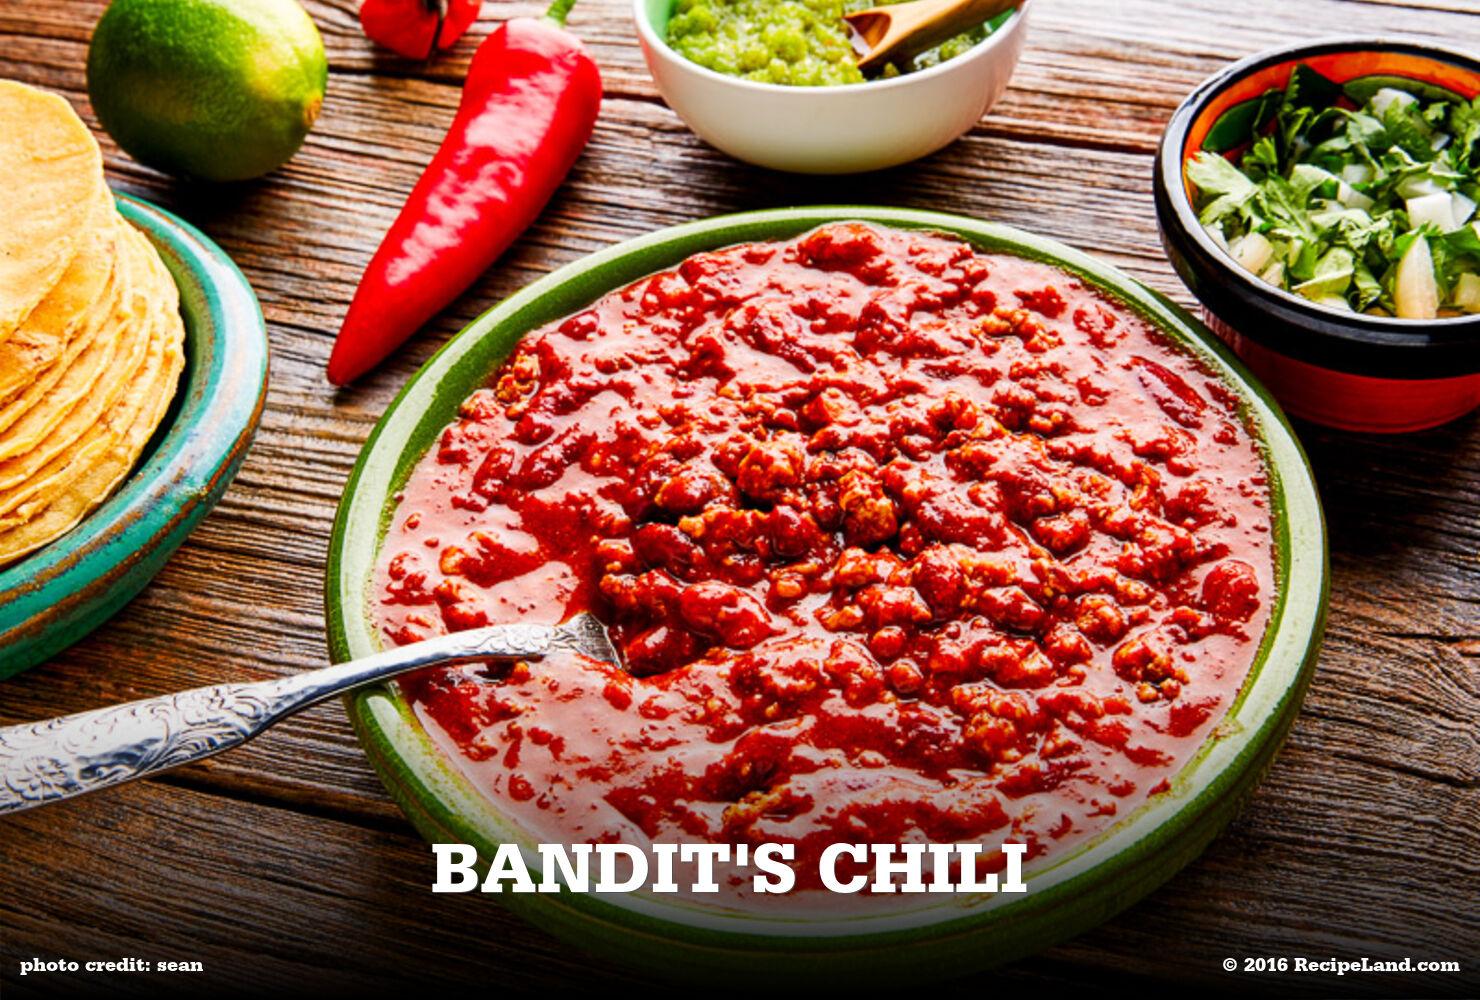 Bandit's Chili